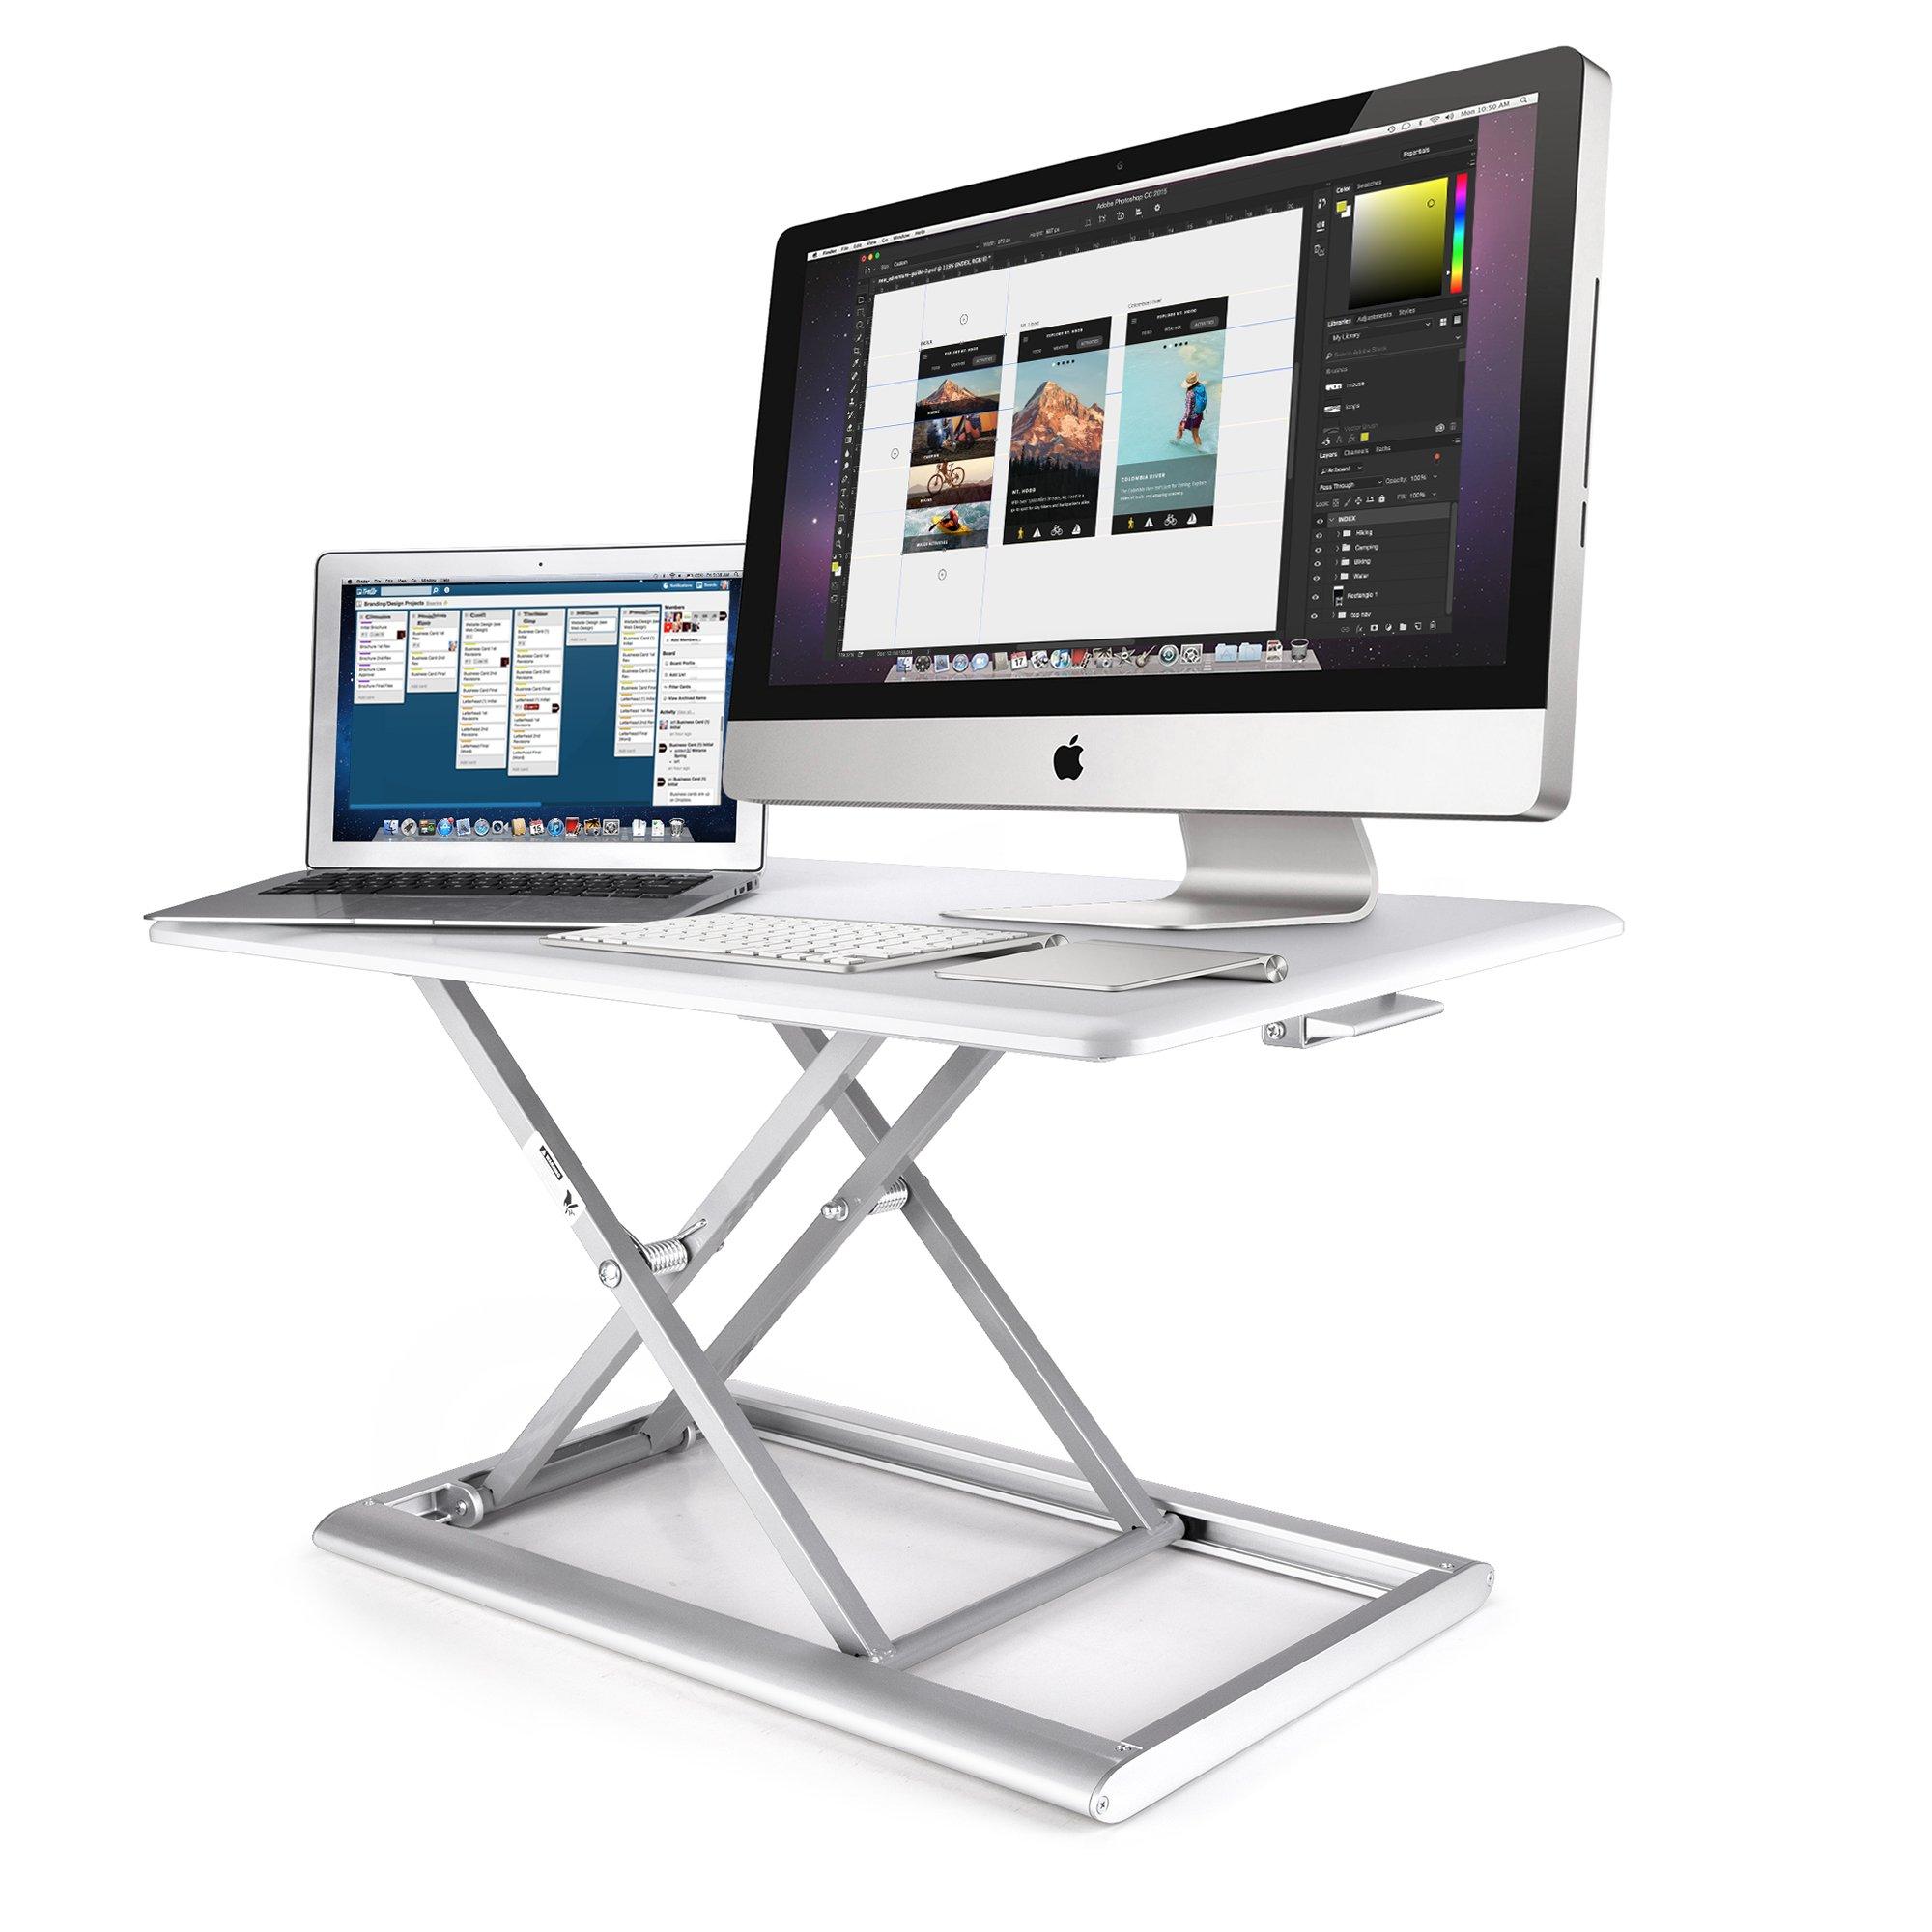 AboveTEK Compact & Solid Aluminum Standing Desk, 30'' Desktop Platform Height Adjustable w/Smooth Air Assist, Instant Sit Stand Converter & Dual Monitor Laptop Computer Riser at Home & Office (White)